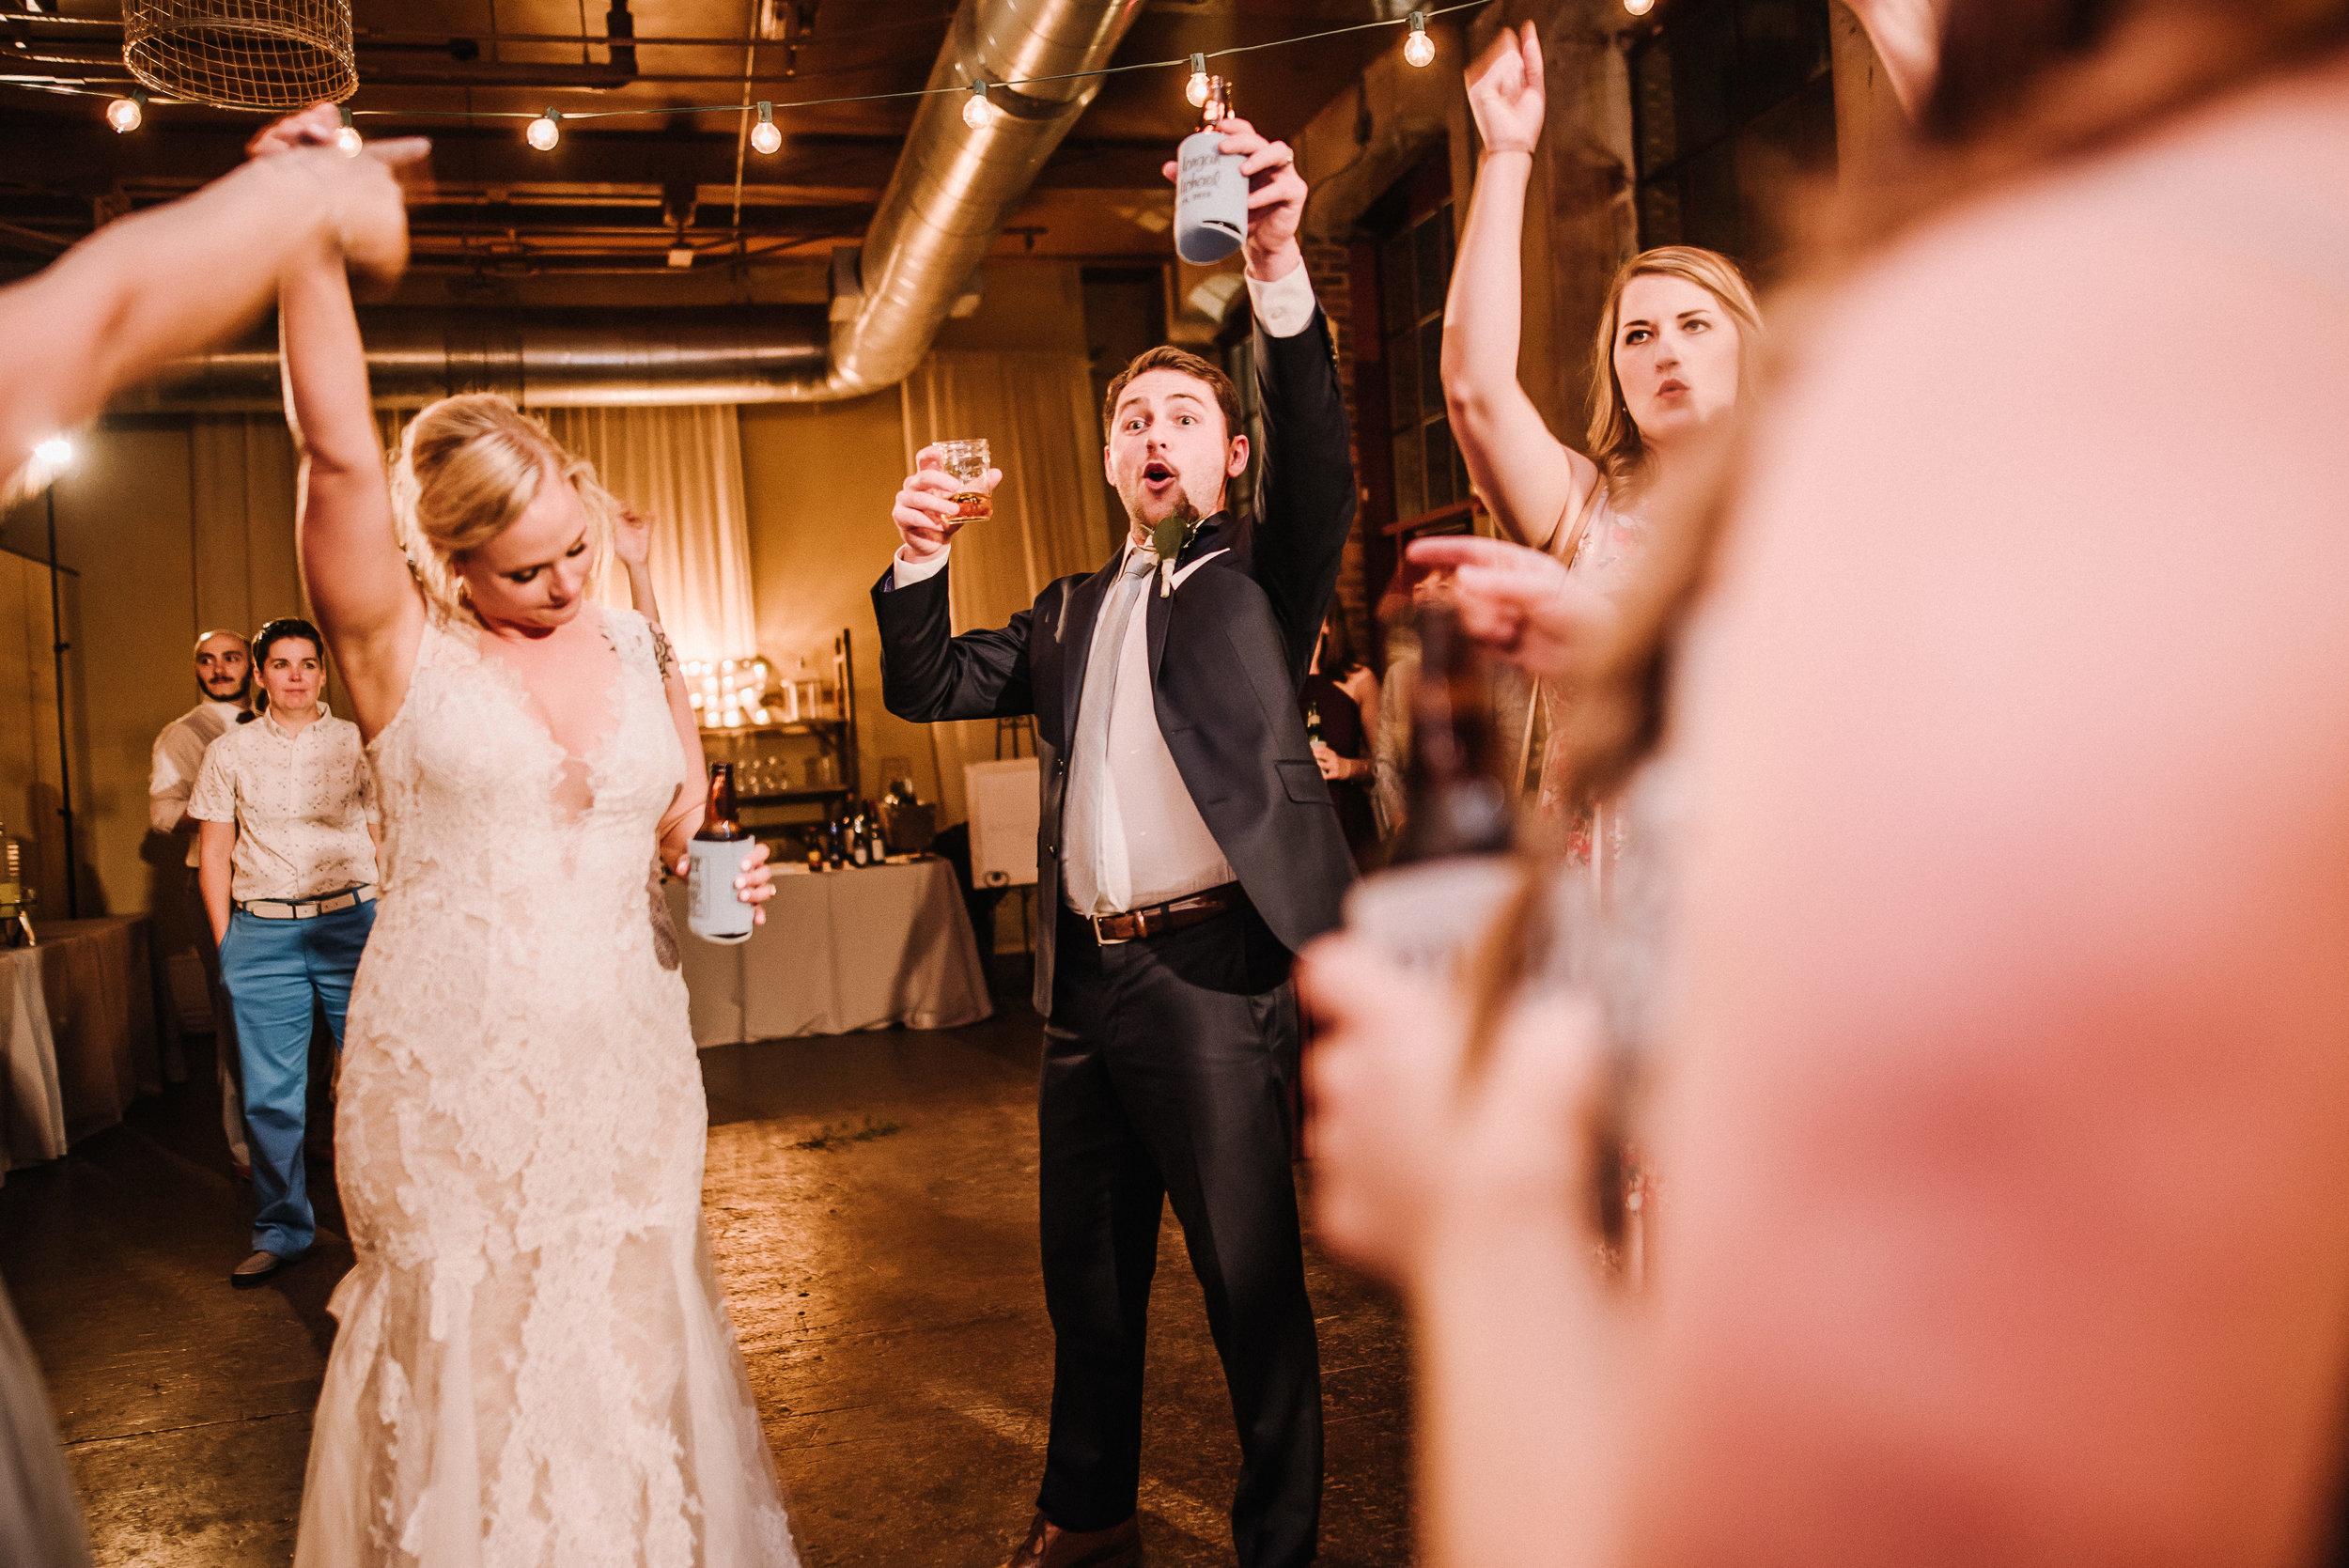 Morgan Wedding_Mill at Yellow River_Ashley Benham Photography-1189.jpg